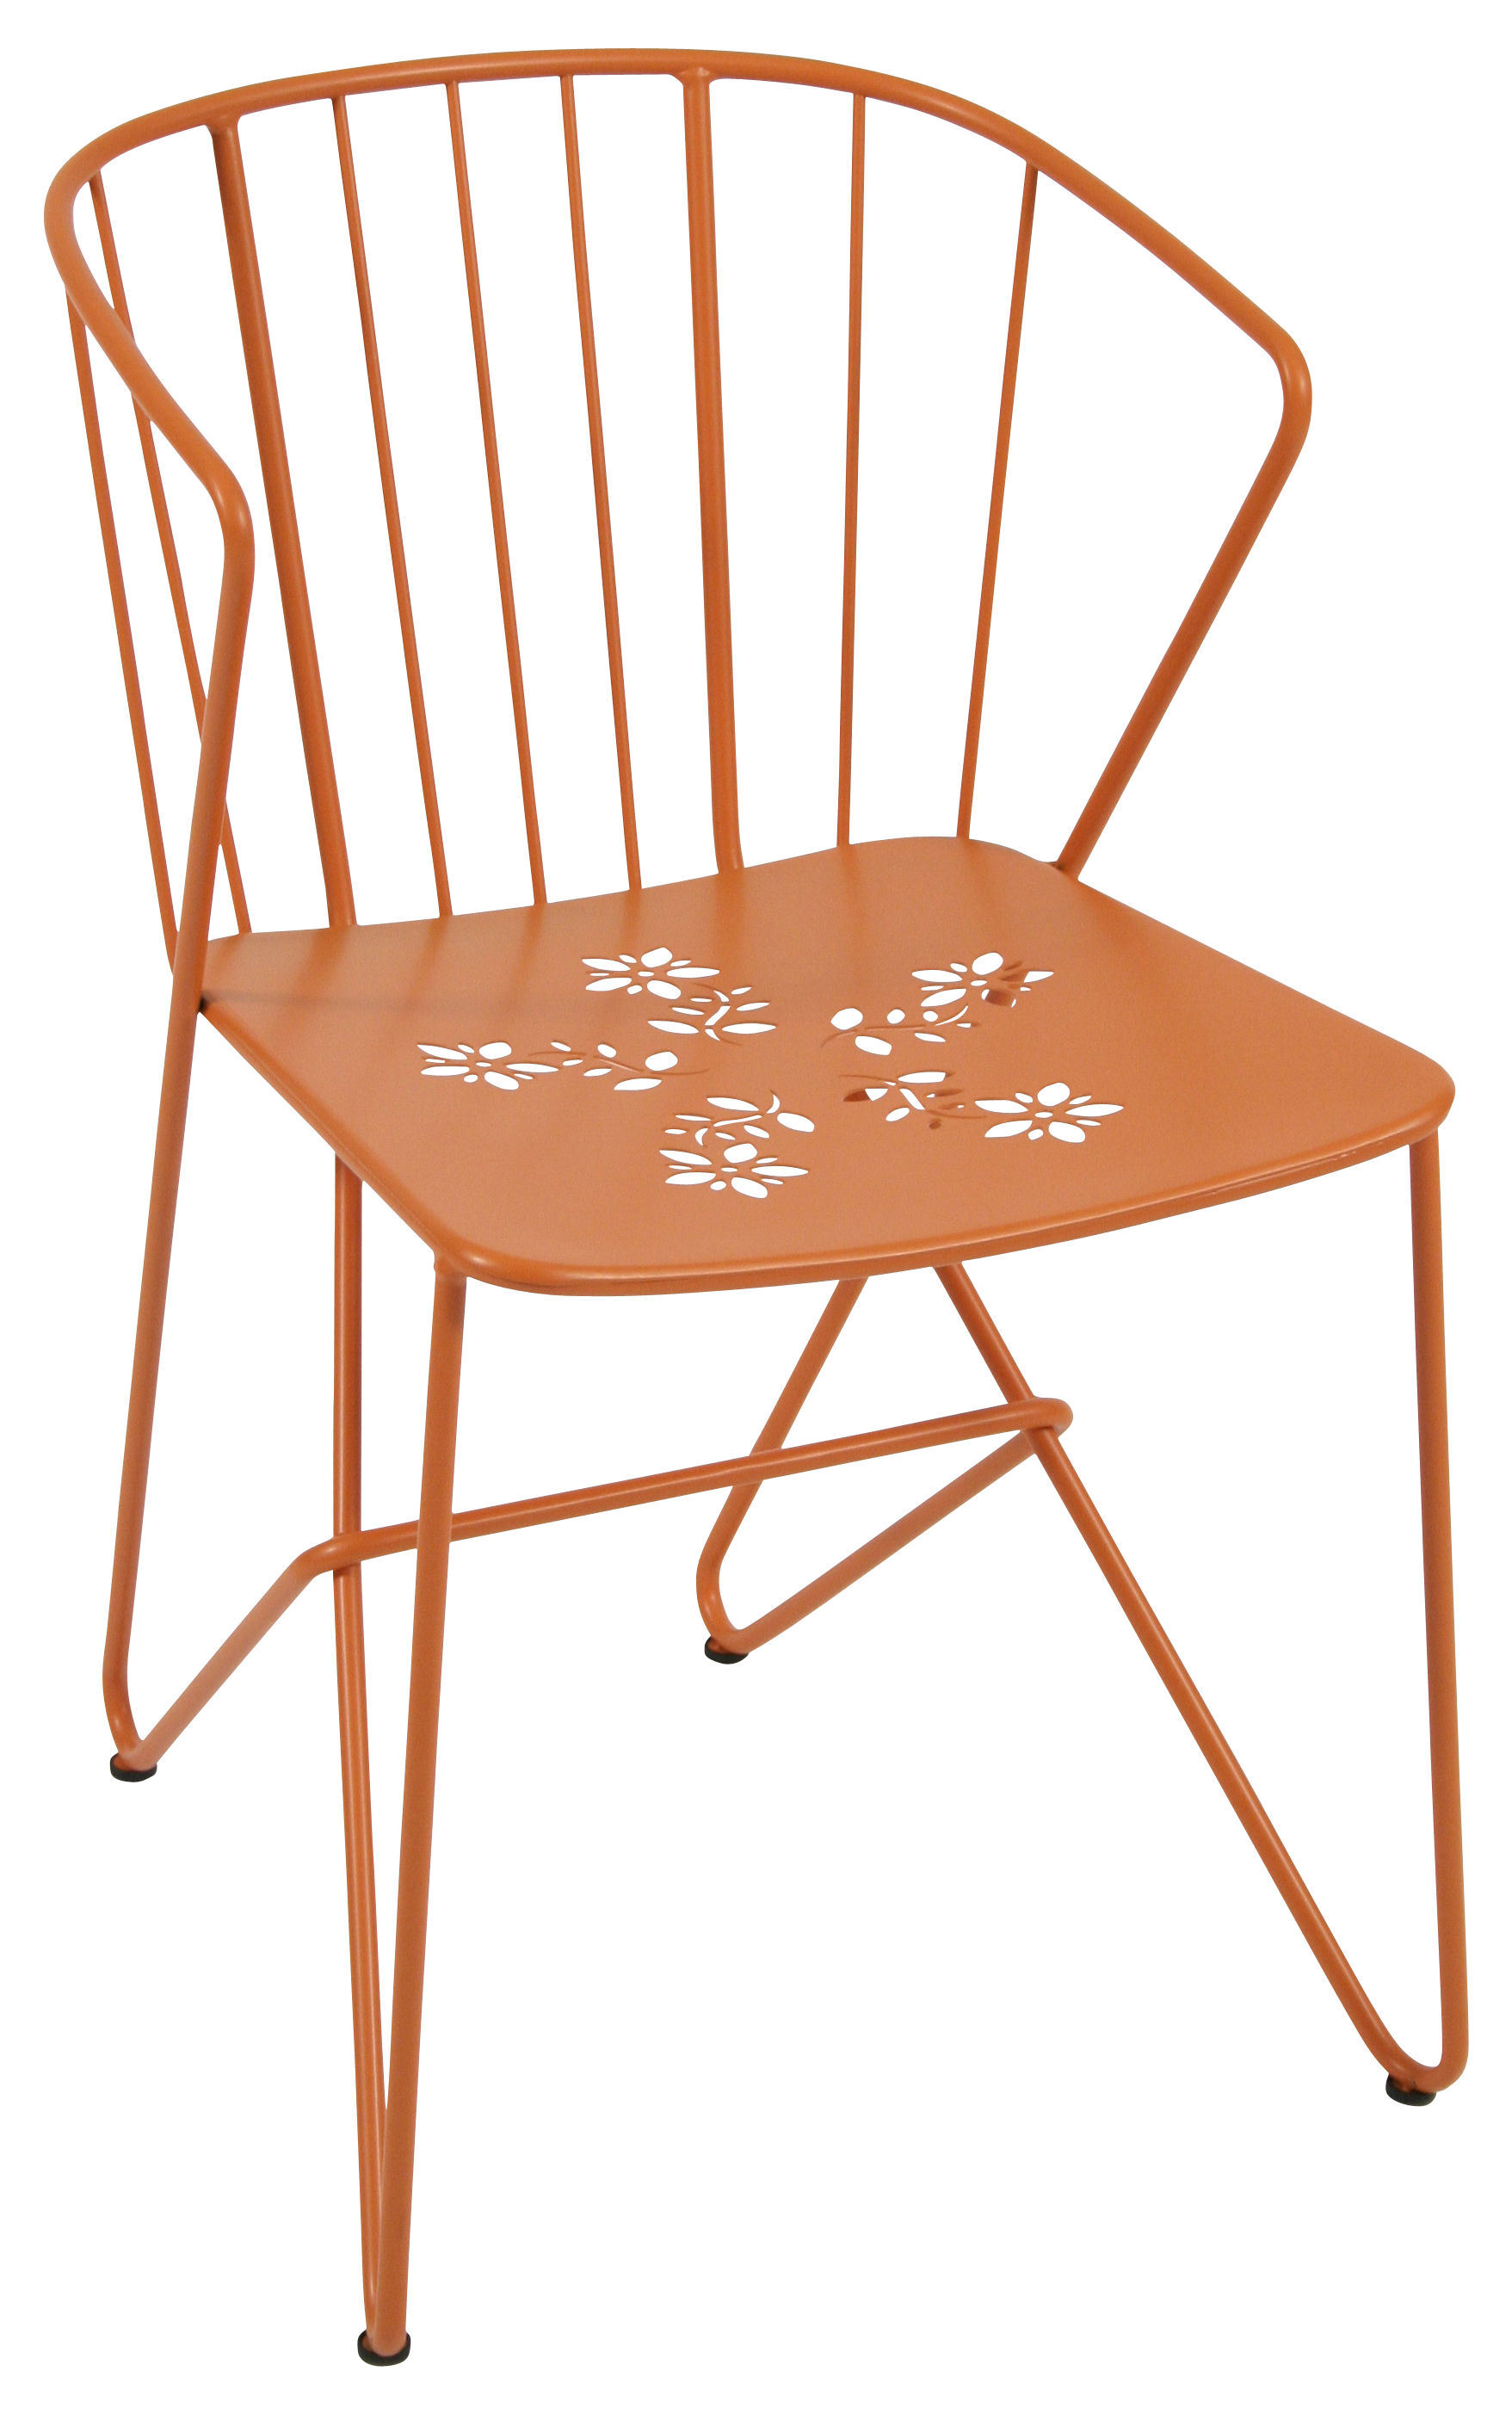 Möbel - Stühle  - Flower Sessel - Fermob - Karotte - Stahl